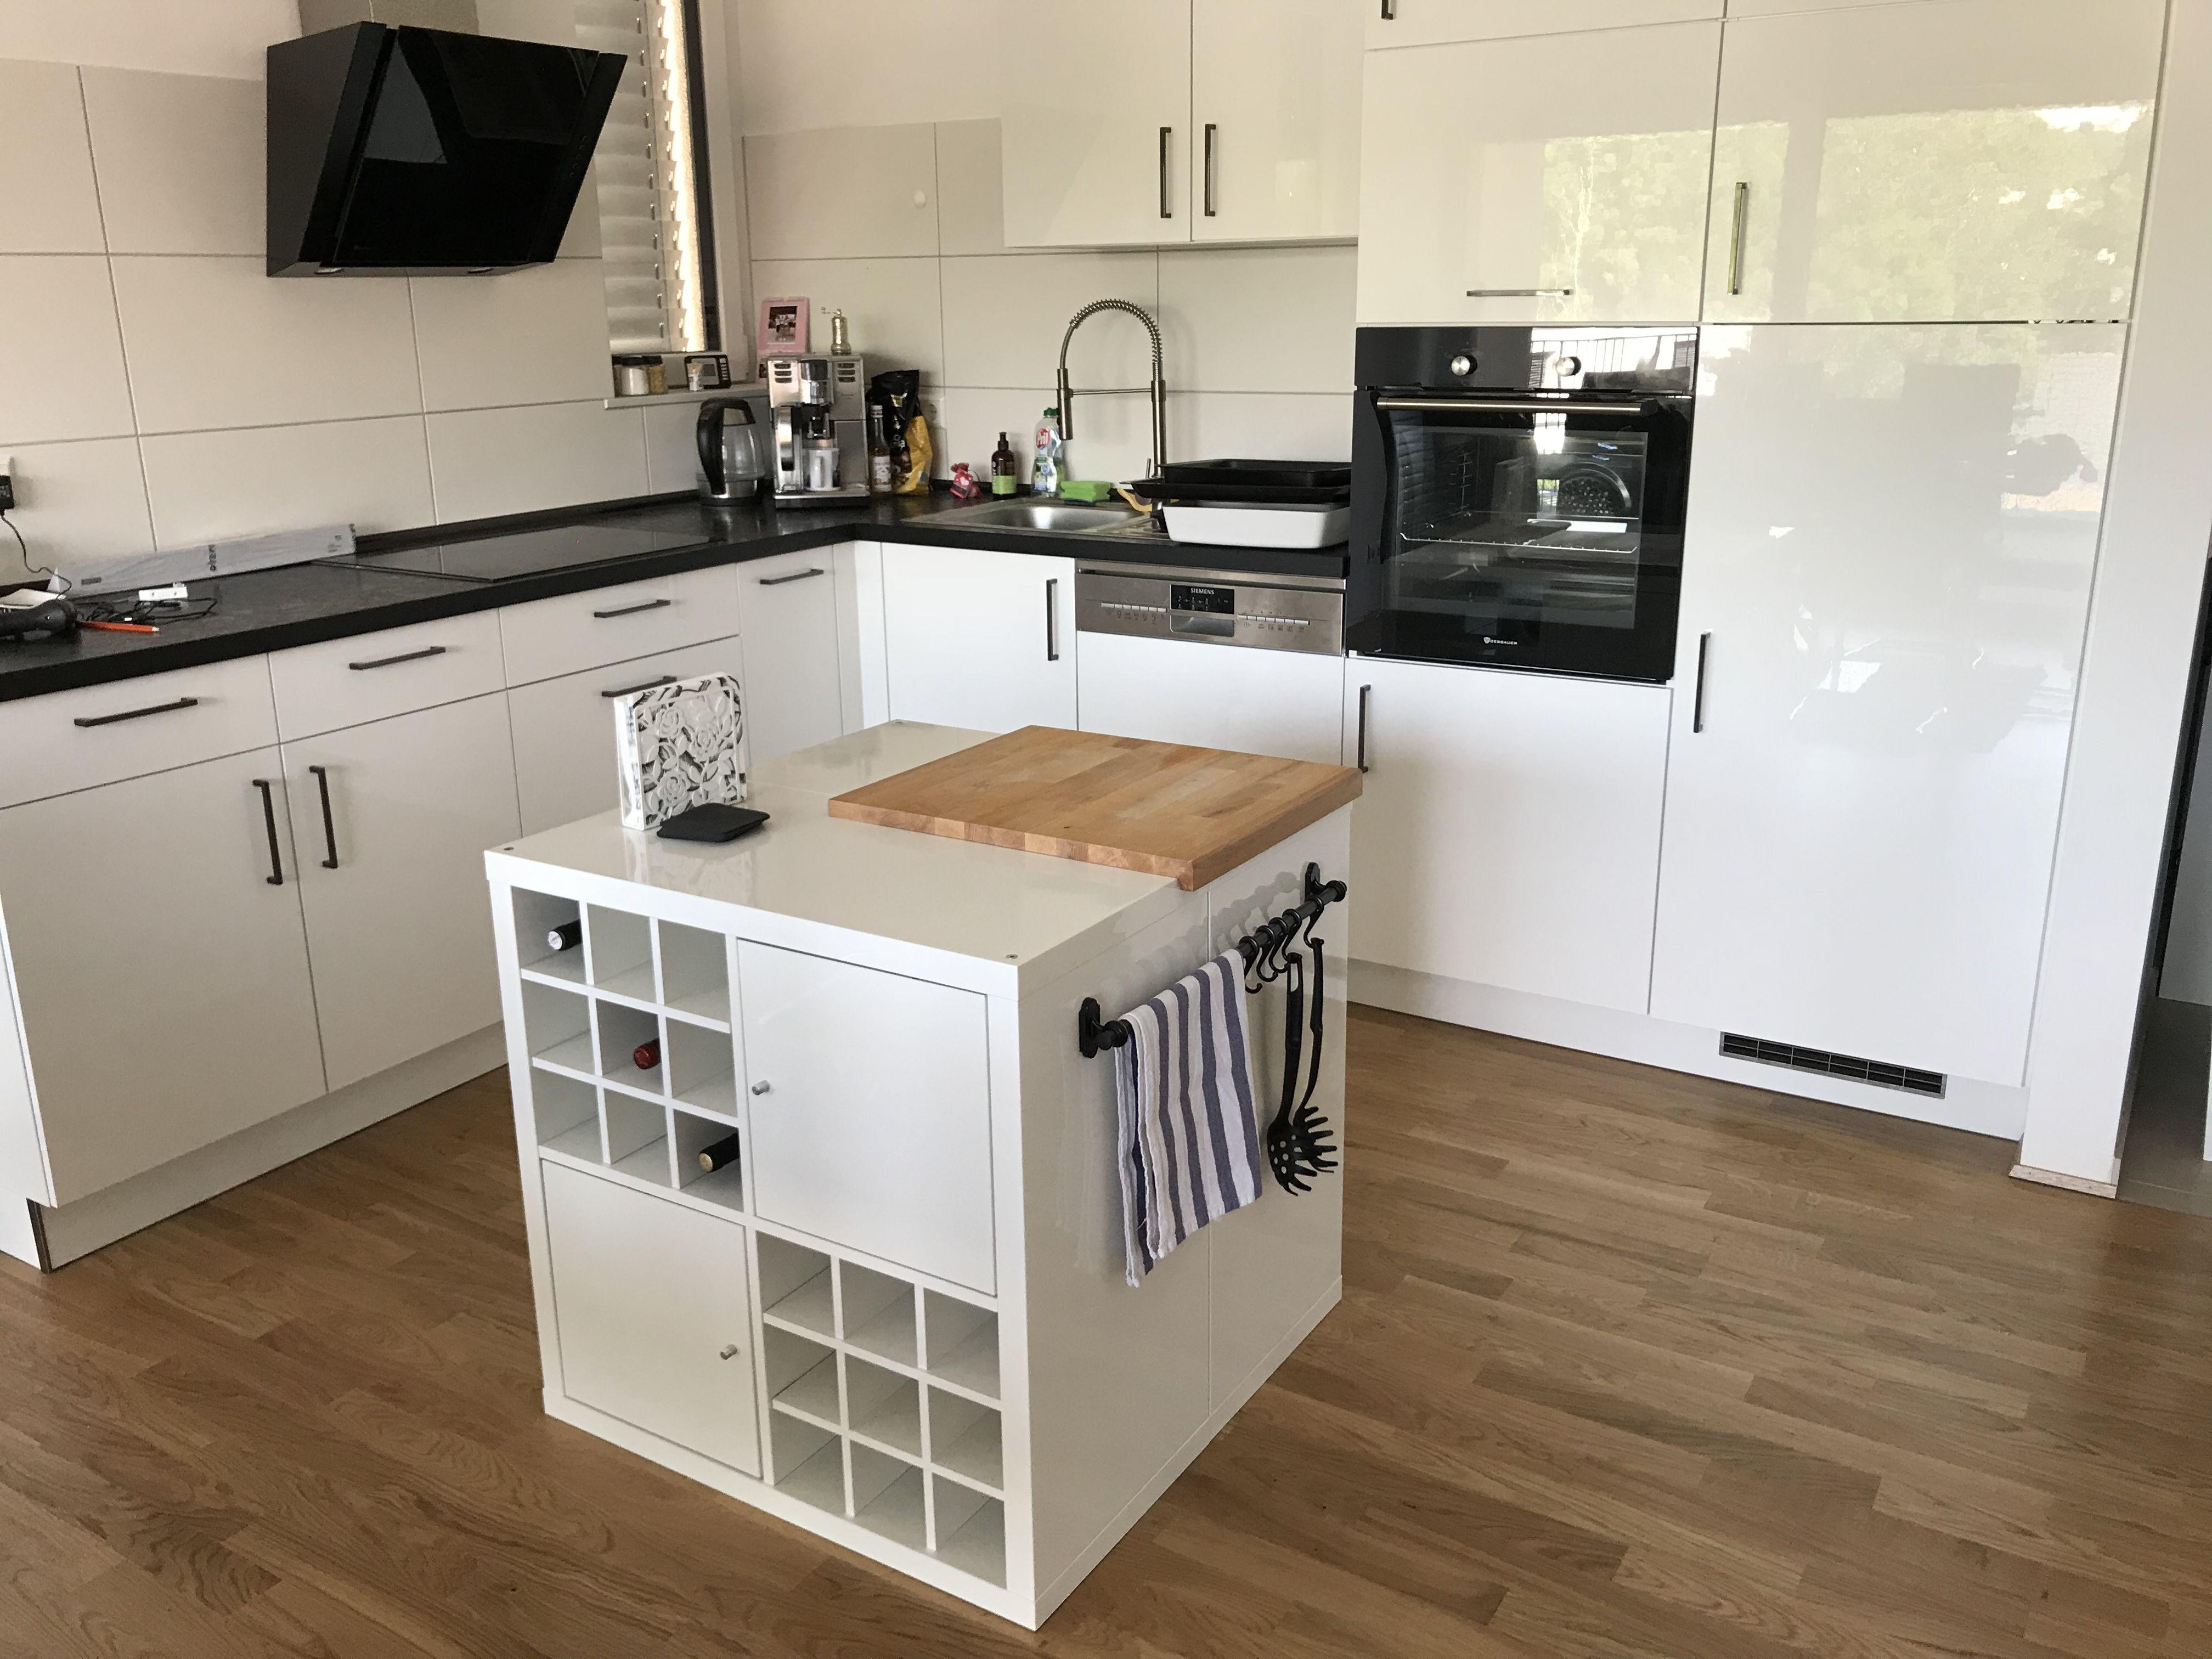 Kücheninsel Diy  Ikea Kücheninsel I key a in 2019